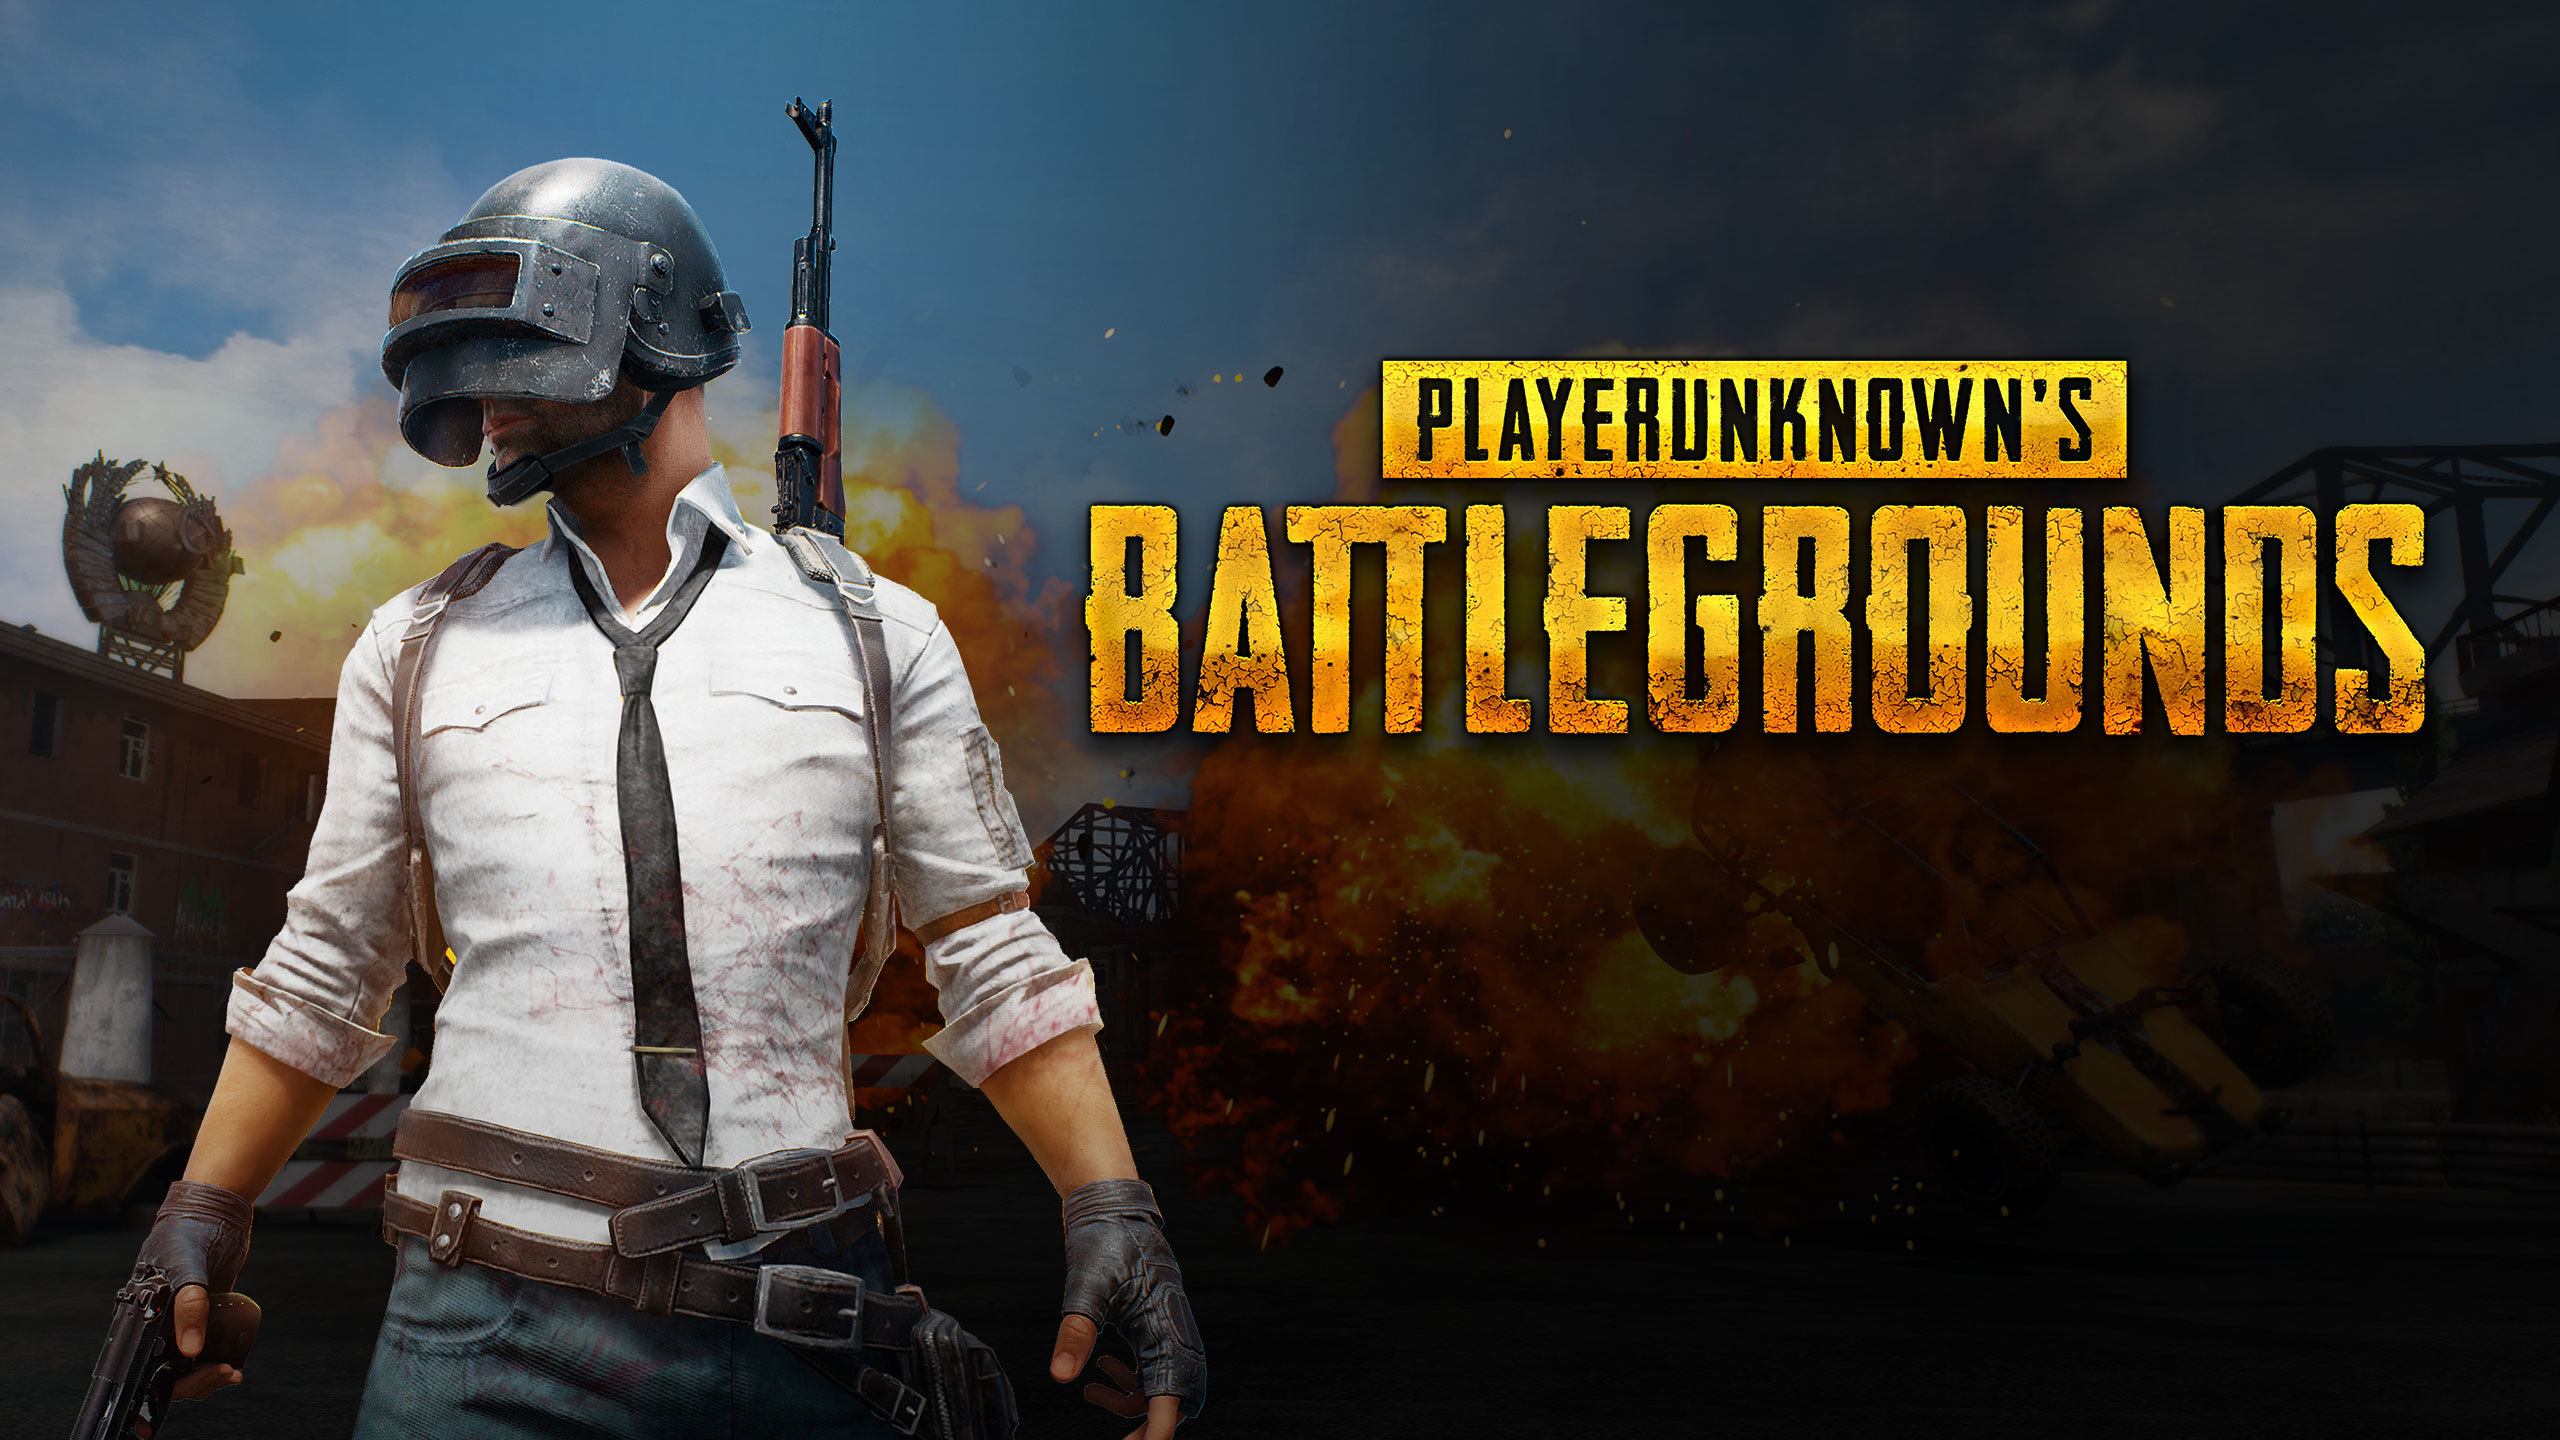 Will China ban PlayerUnknown's Battlegrounds? – Niko